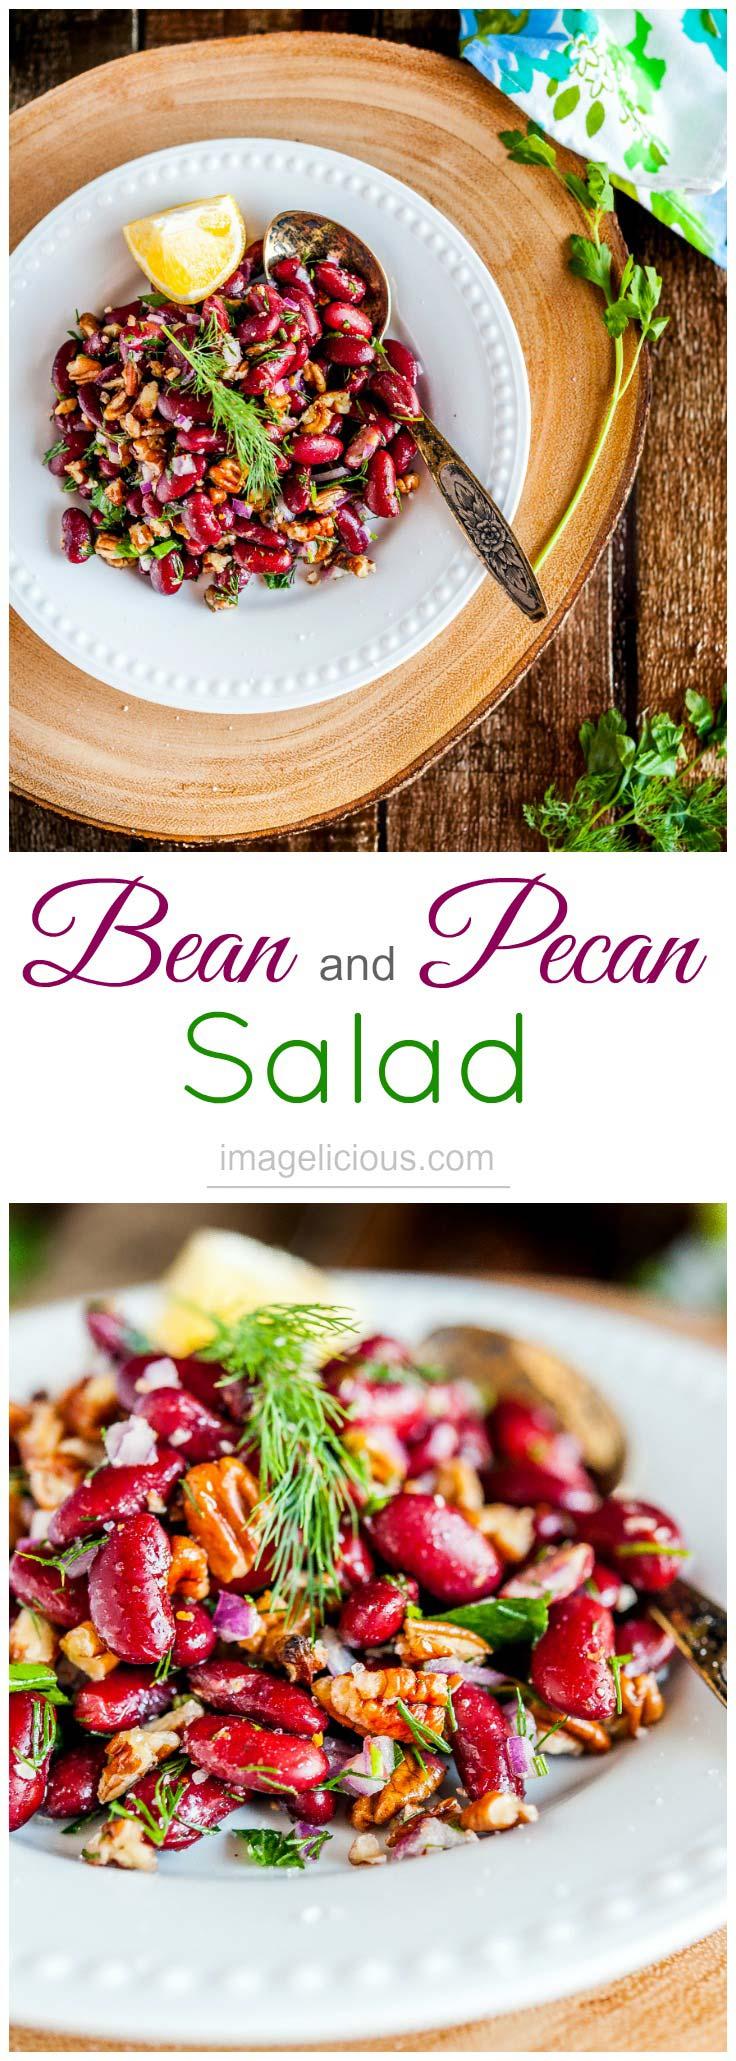 Beans | Pecans | Salad | Summer | Picnic | Potluck | Vegan | Gluten-free | Russian